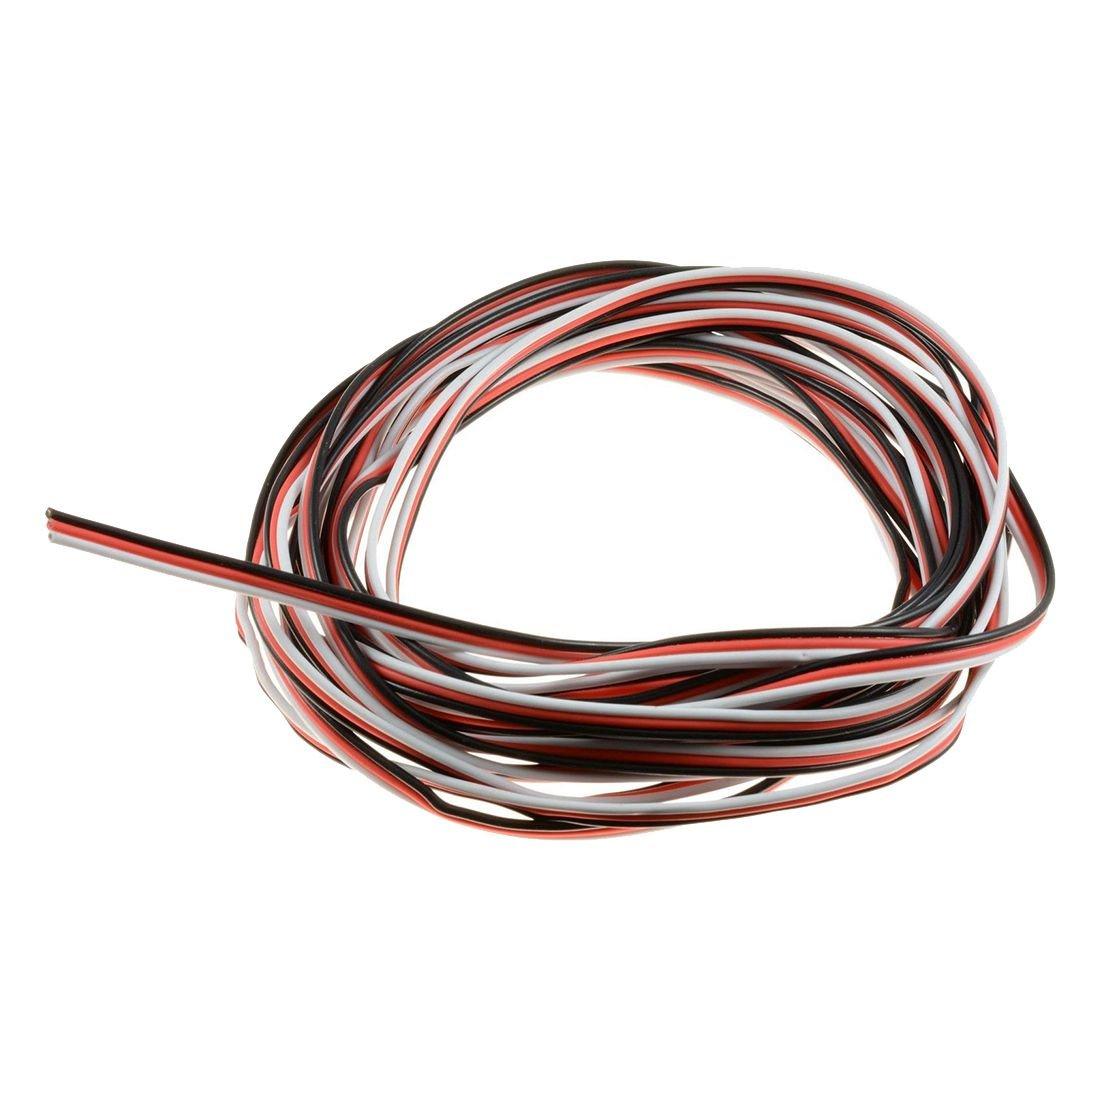 SODIAL(R) 10m Servo Wire Cable 22awg Futaba 3-Pin 140073